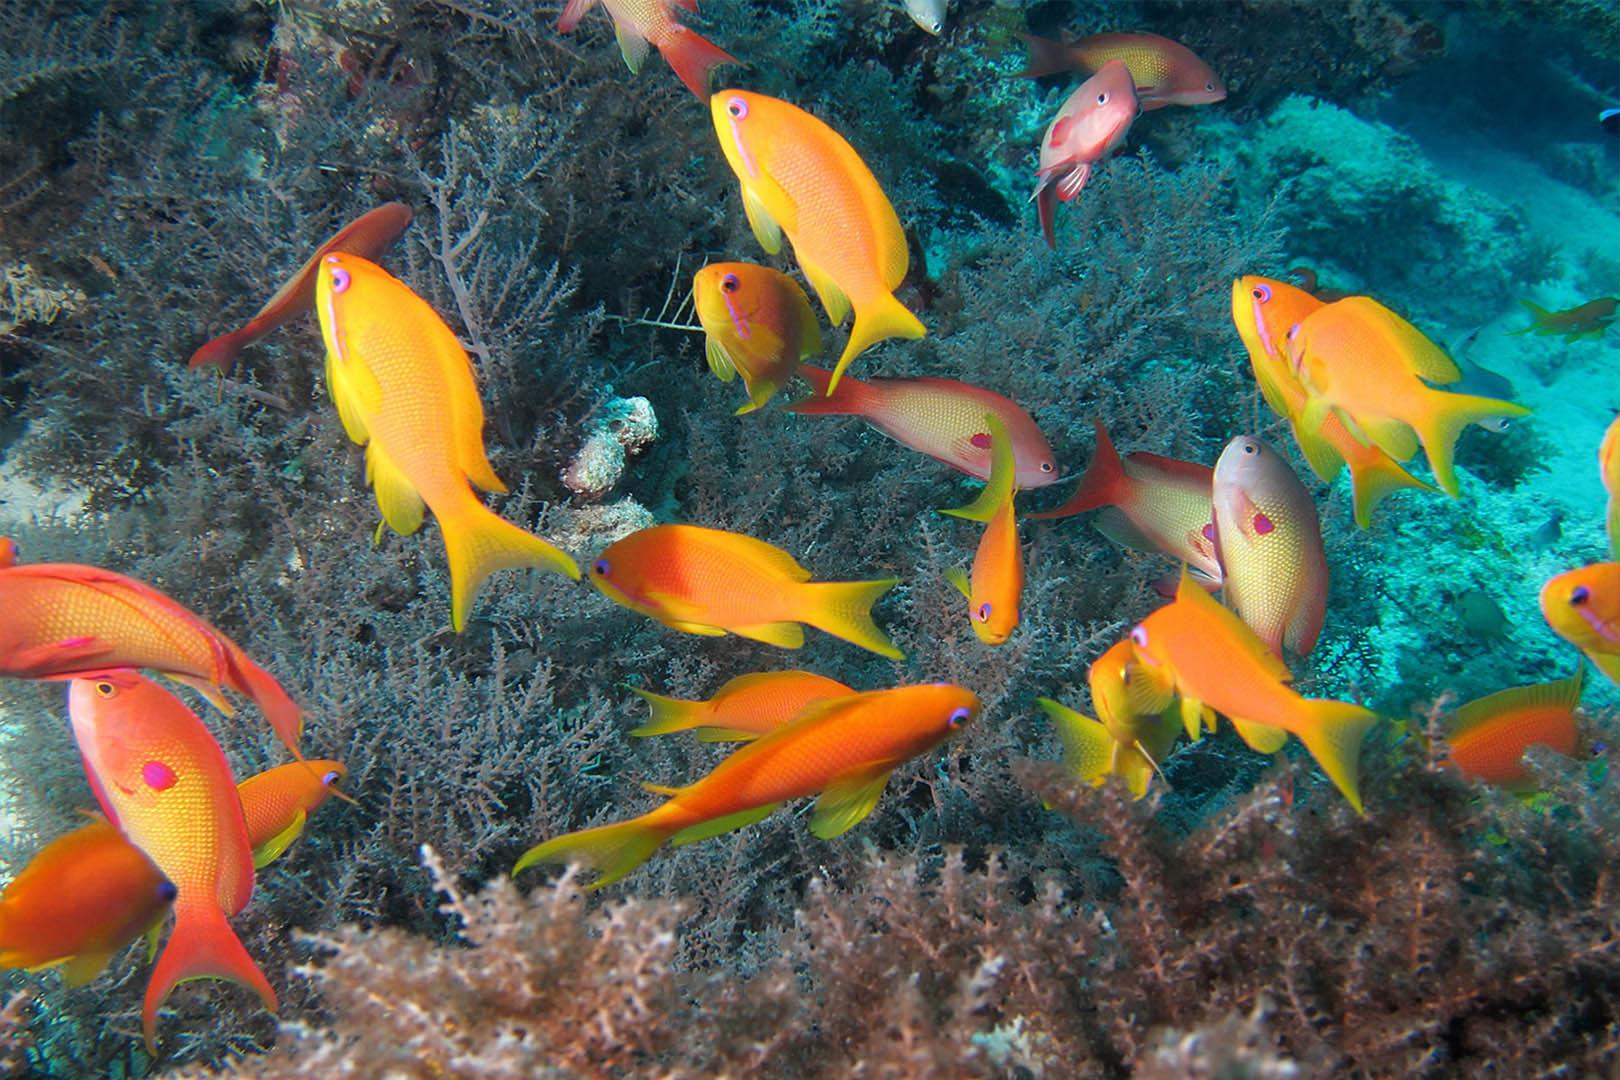 gallery-maasai-wanderings-safari-itineraries-signature-photo-safaris-africa-fish